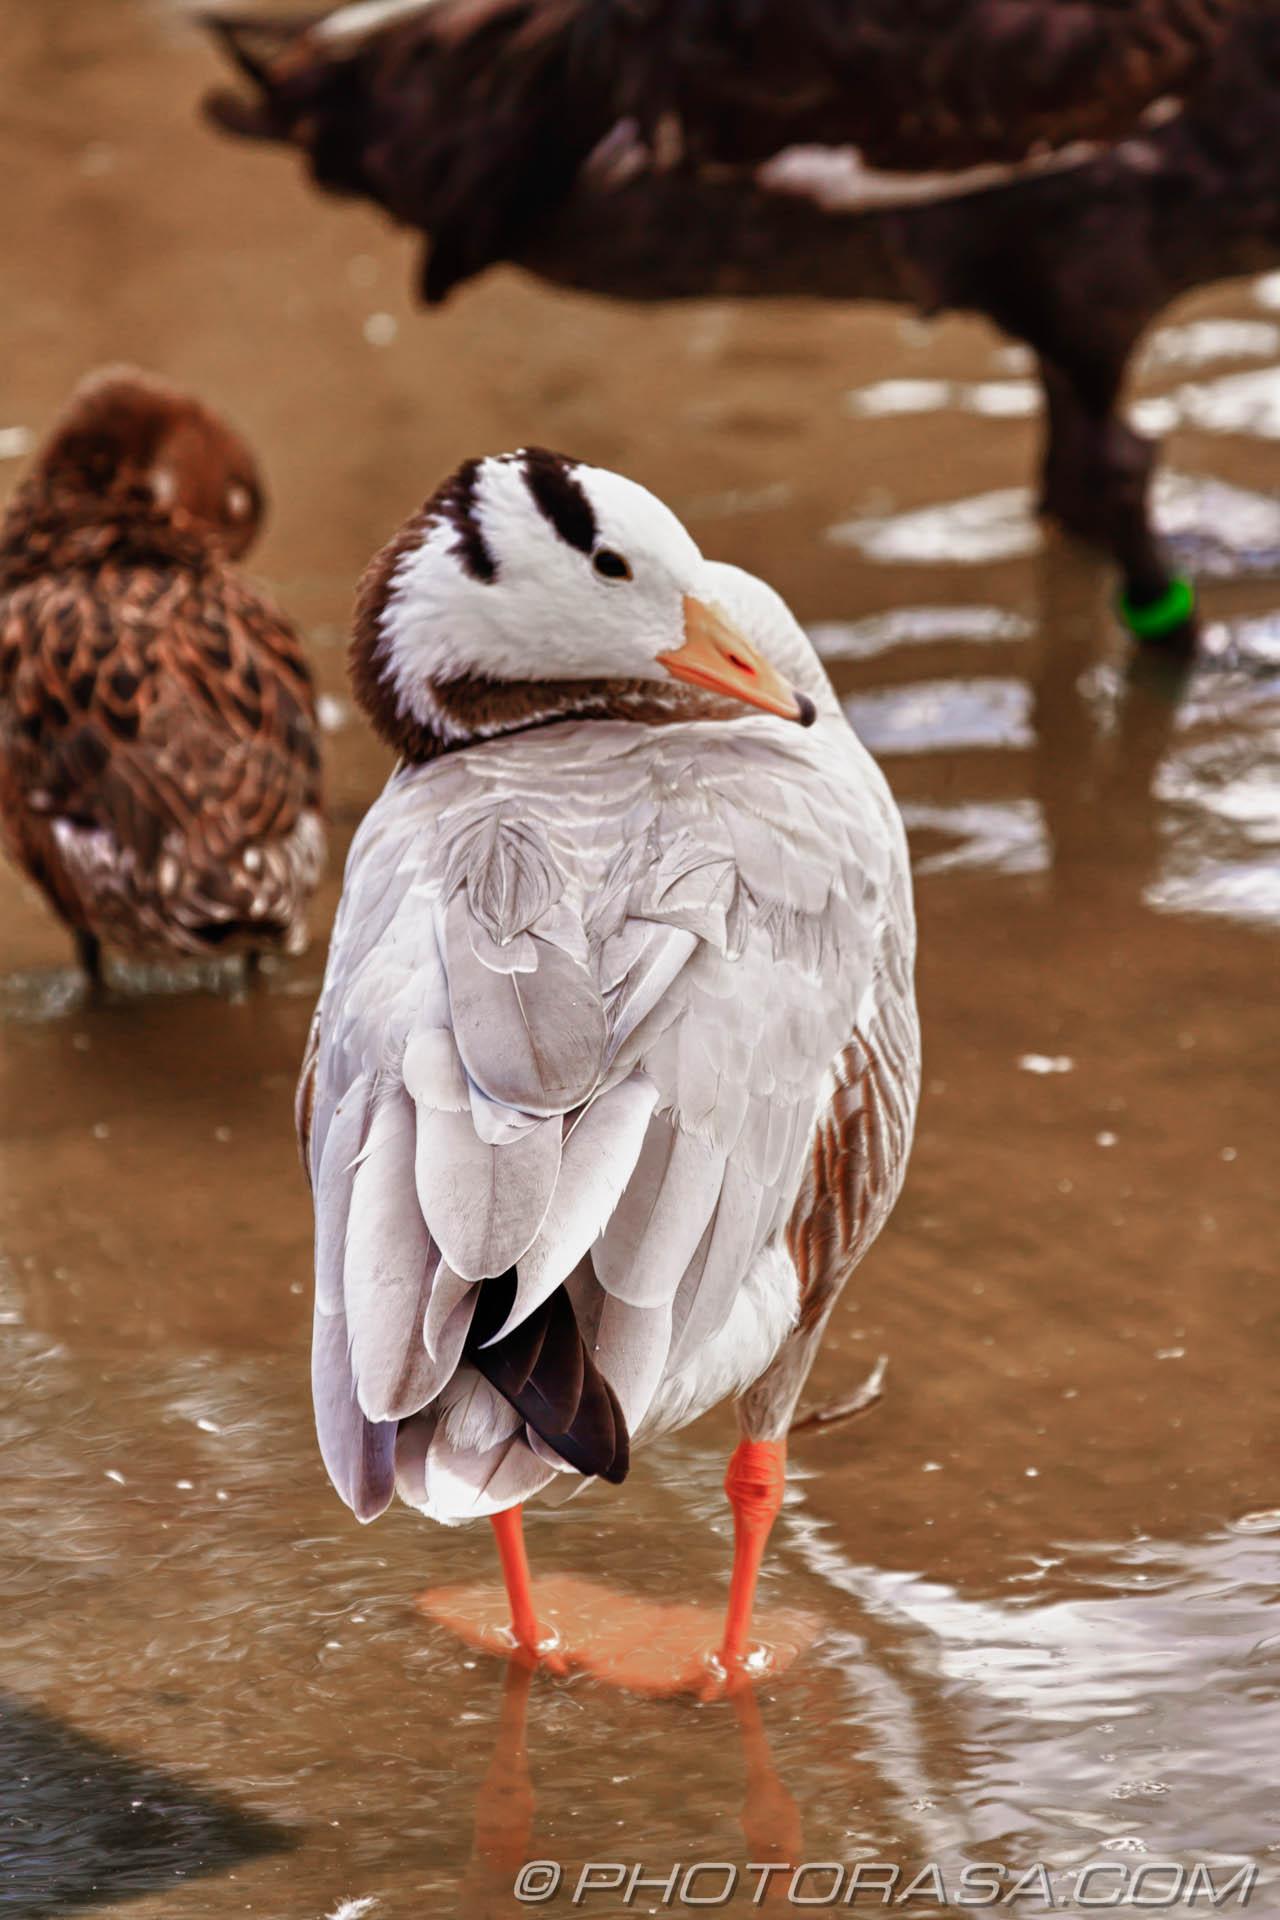 https://photorasa.com/birds-greenworld/boa-headed-goose/